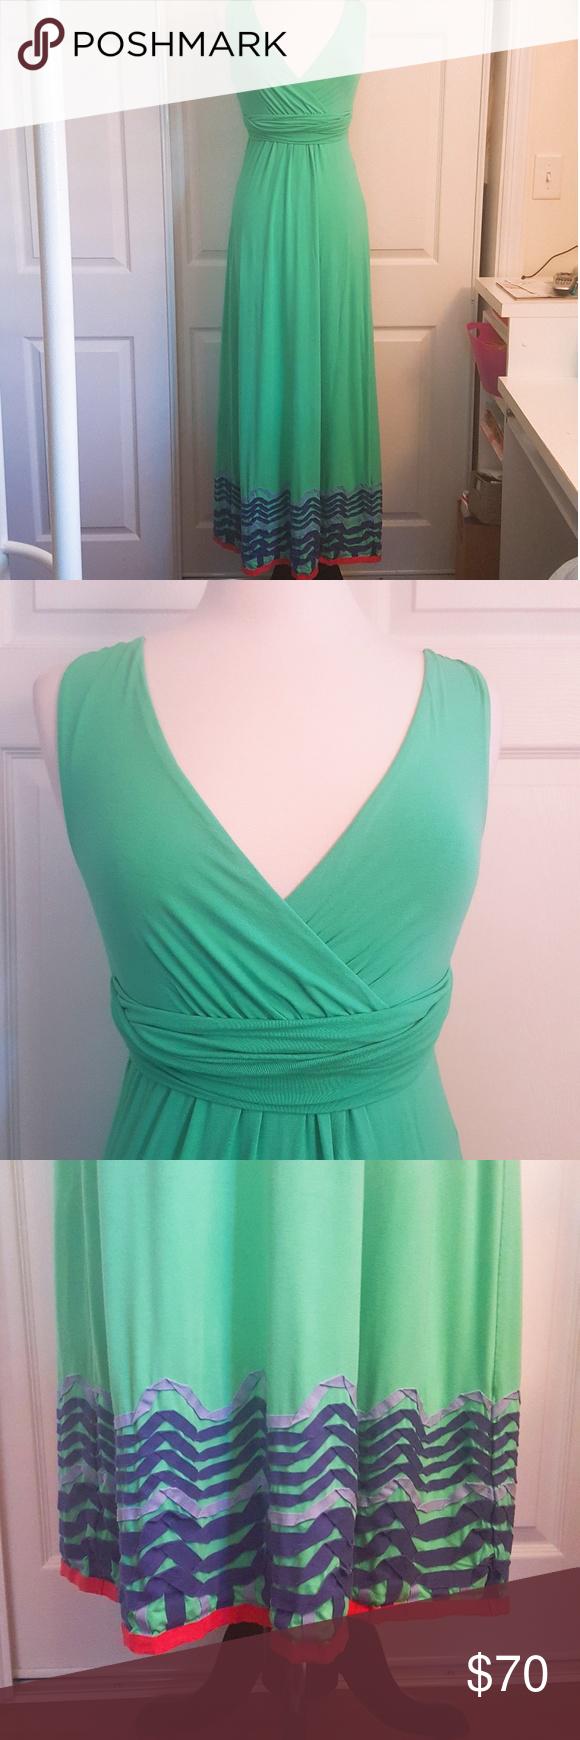 Boden Green Maxi Dress w/ Chevron Design Size 2R   Green maxi ...